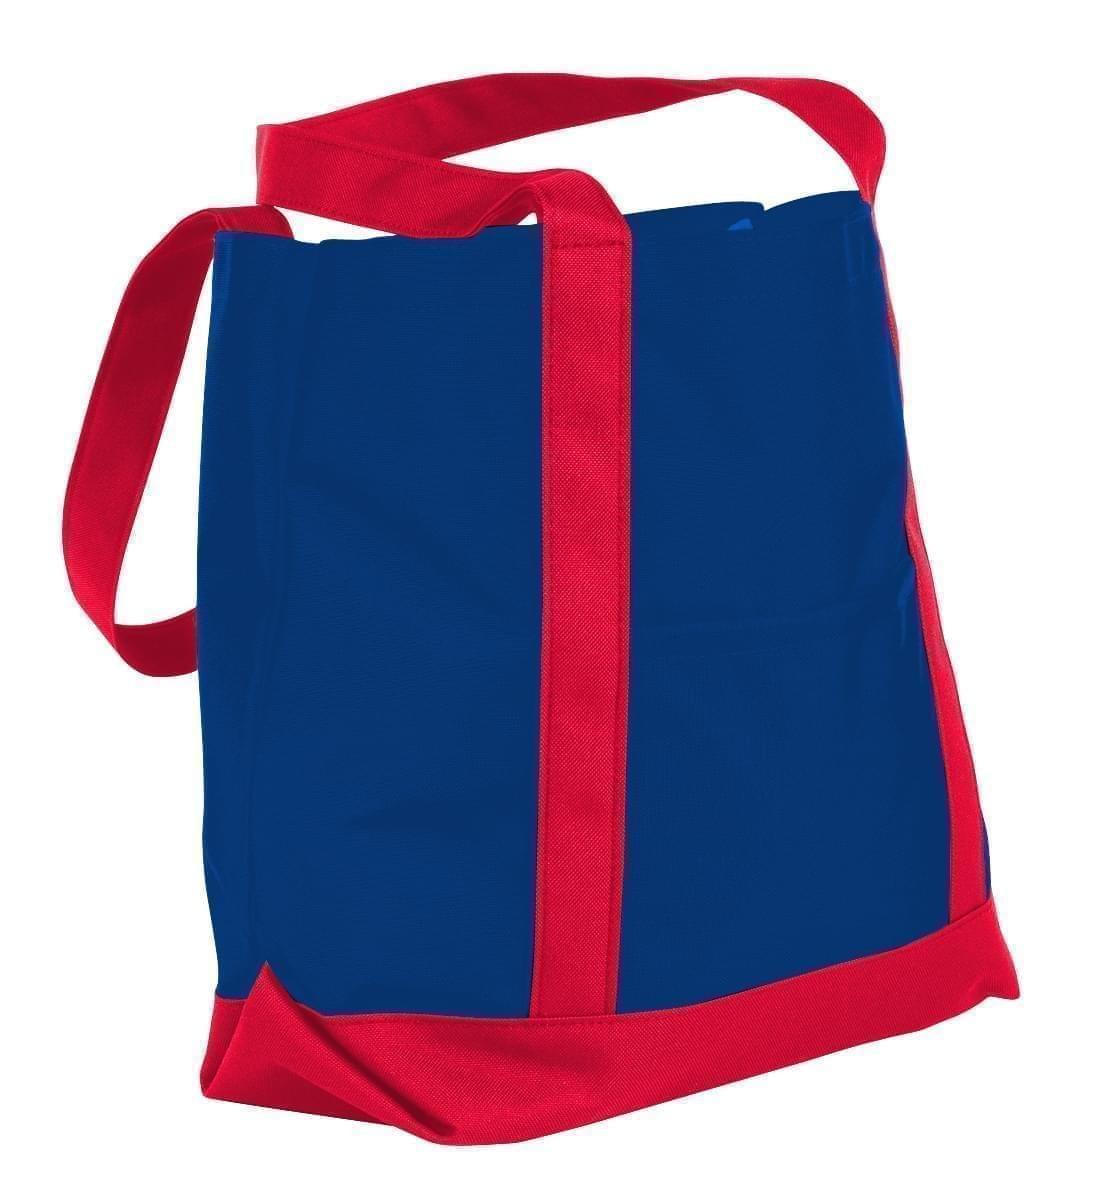 USA Made Nylon Poly Boat Tote Bags, XAACL1-600